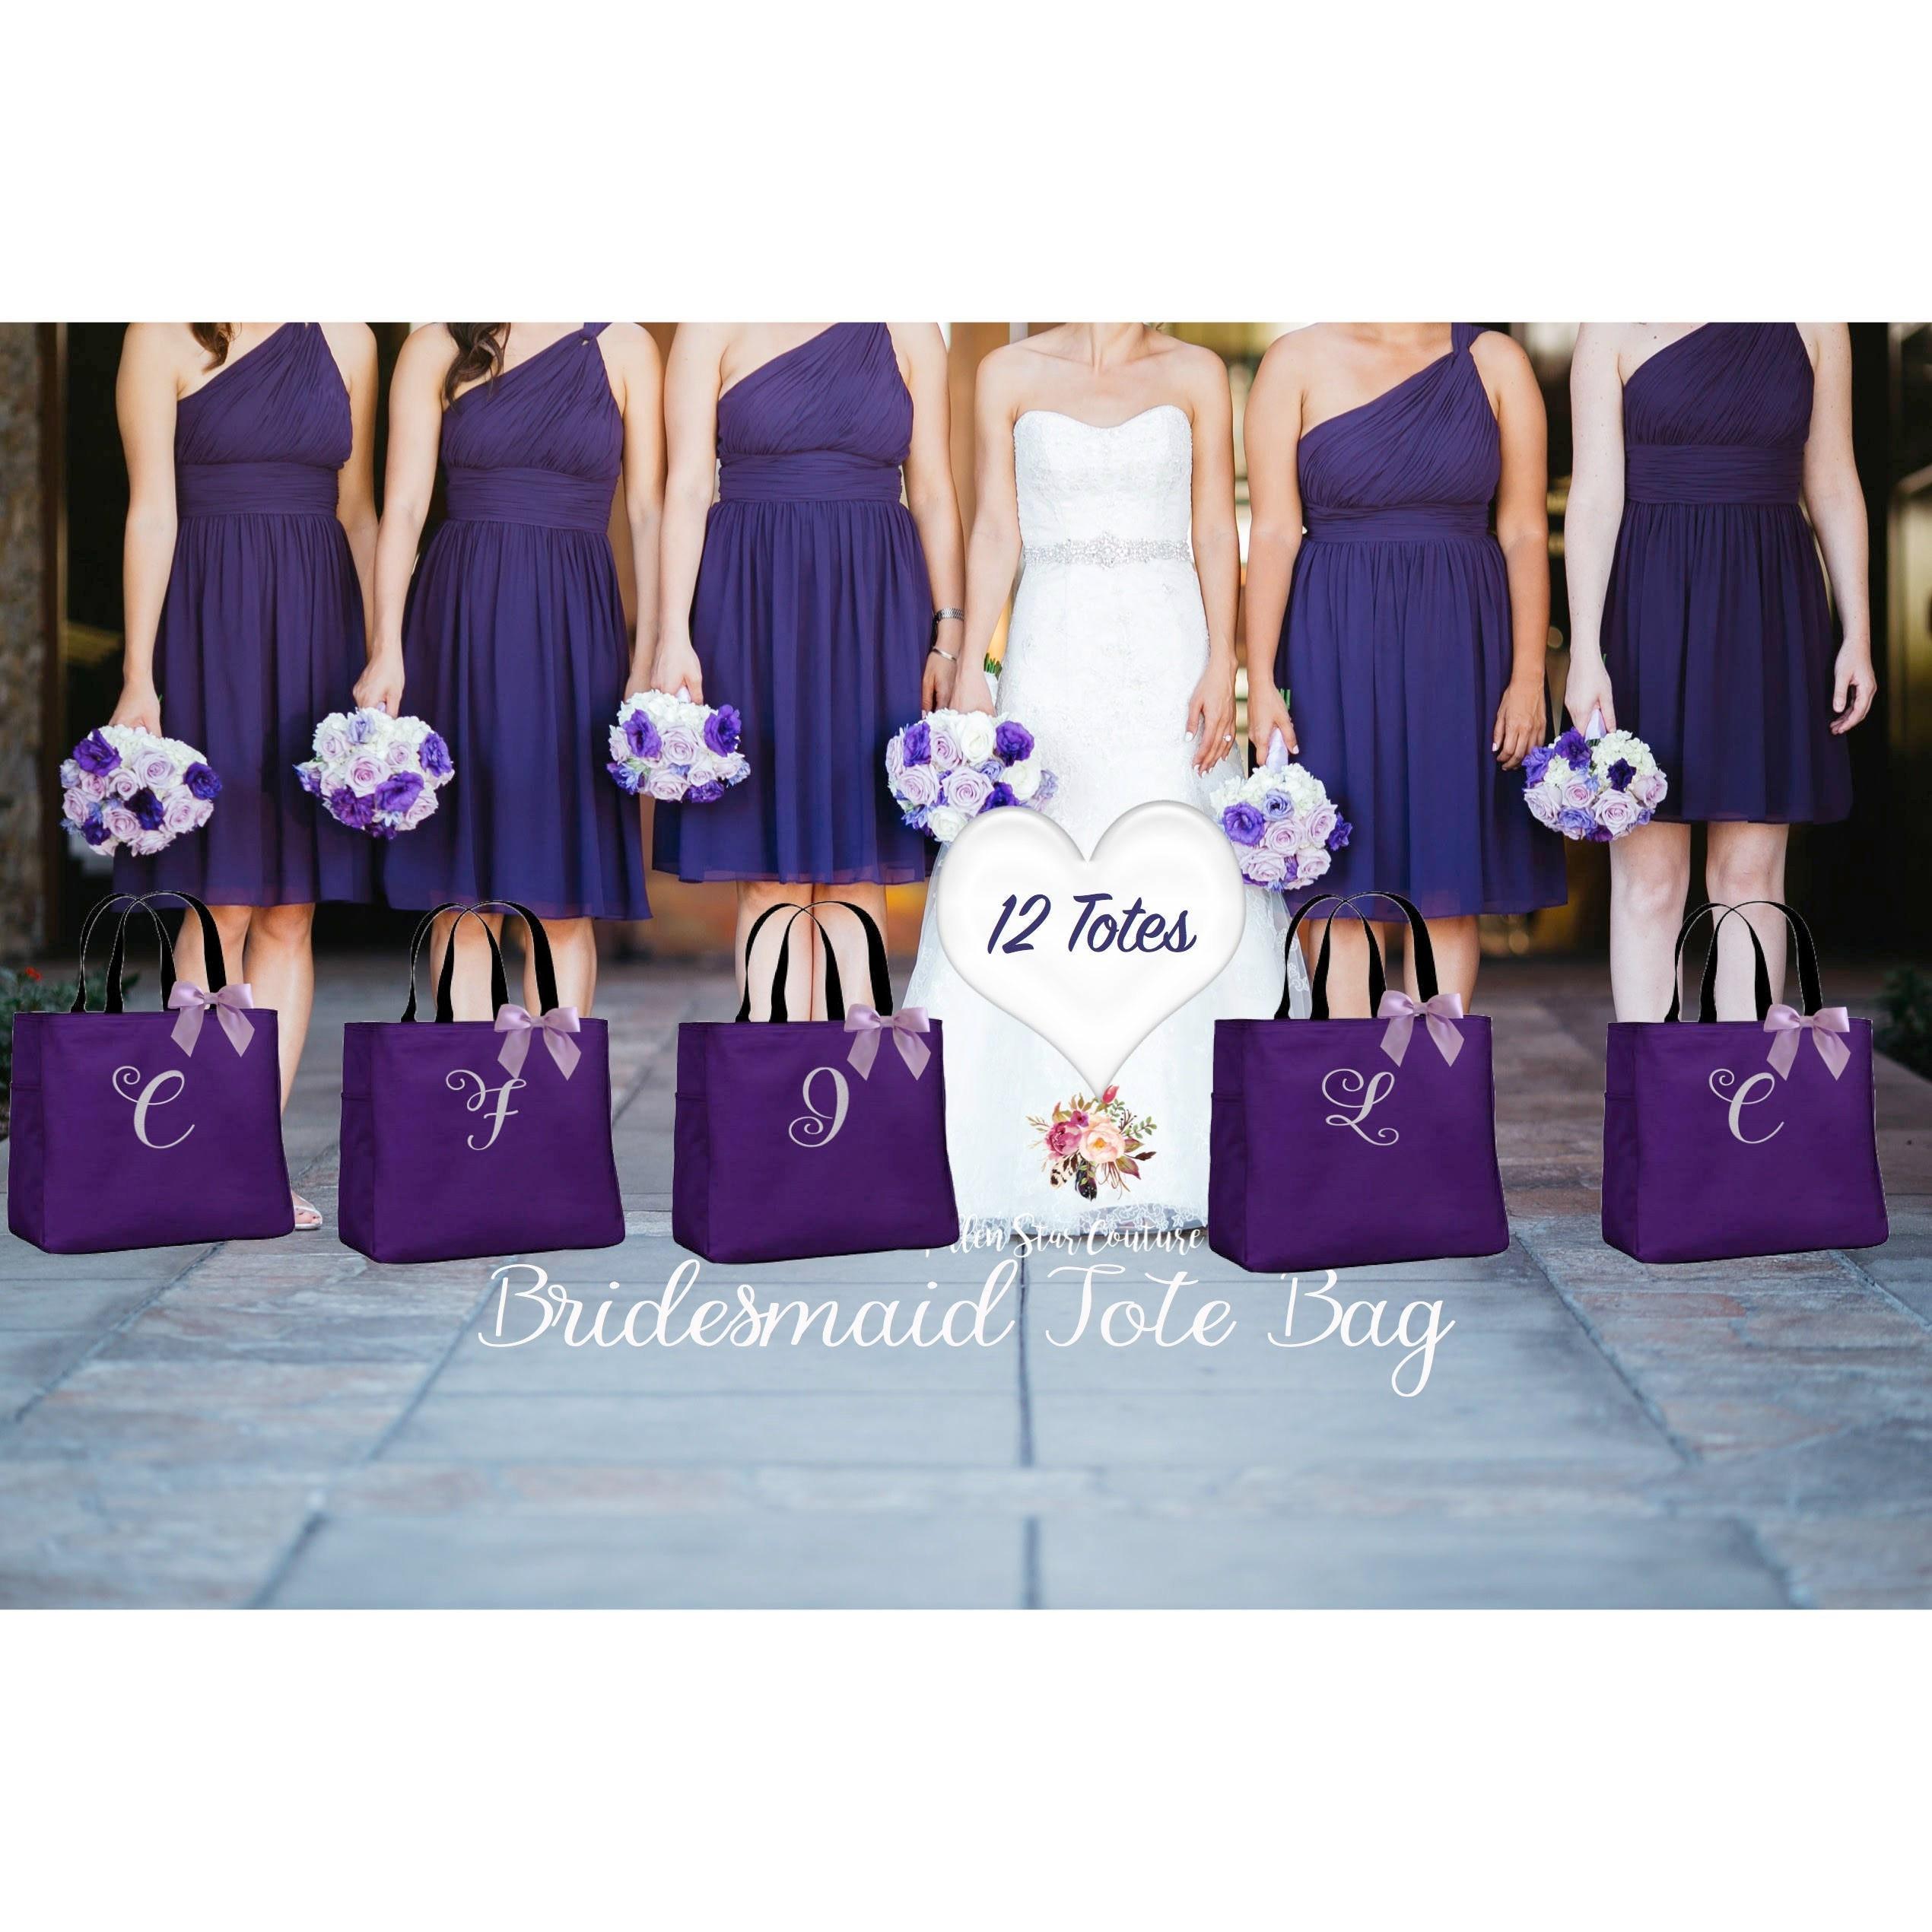 12 wedding party tote bags bridesmaid wedding gifts wedding tote